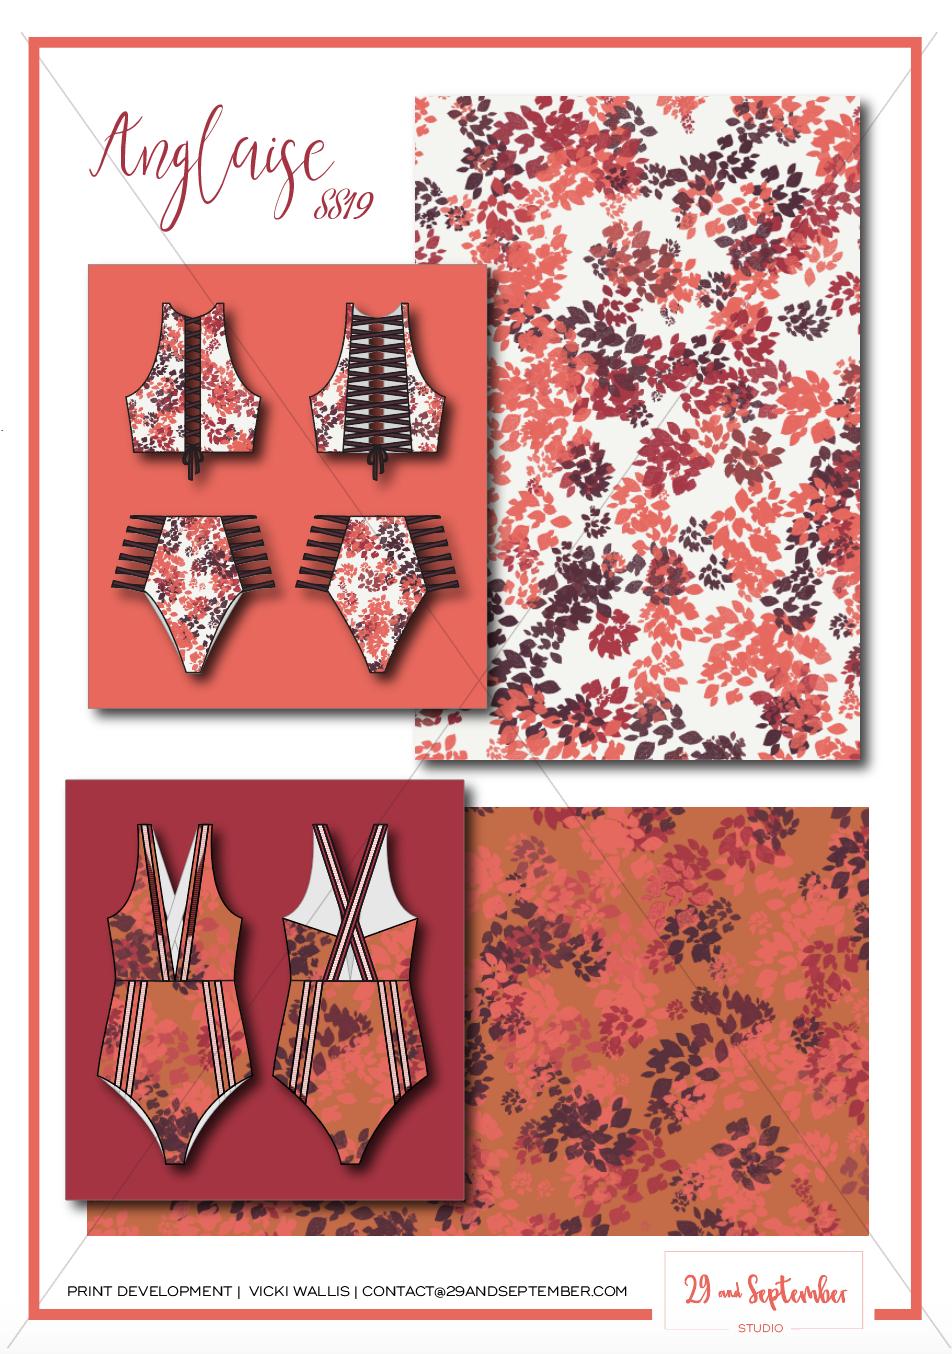 Swimwear inspiration | technical drawings for swimwear | textile print design